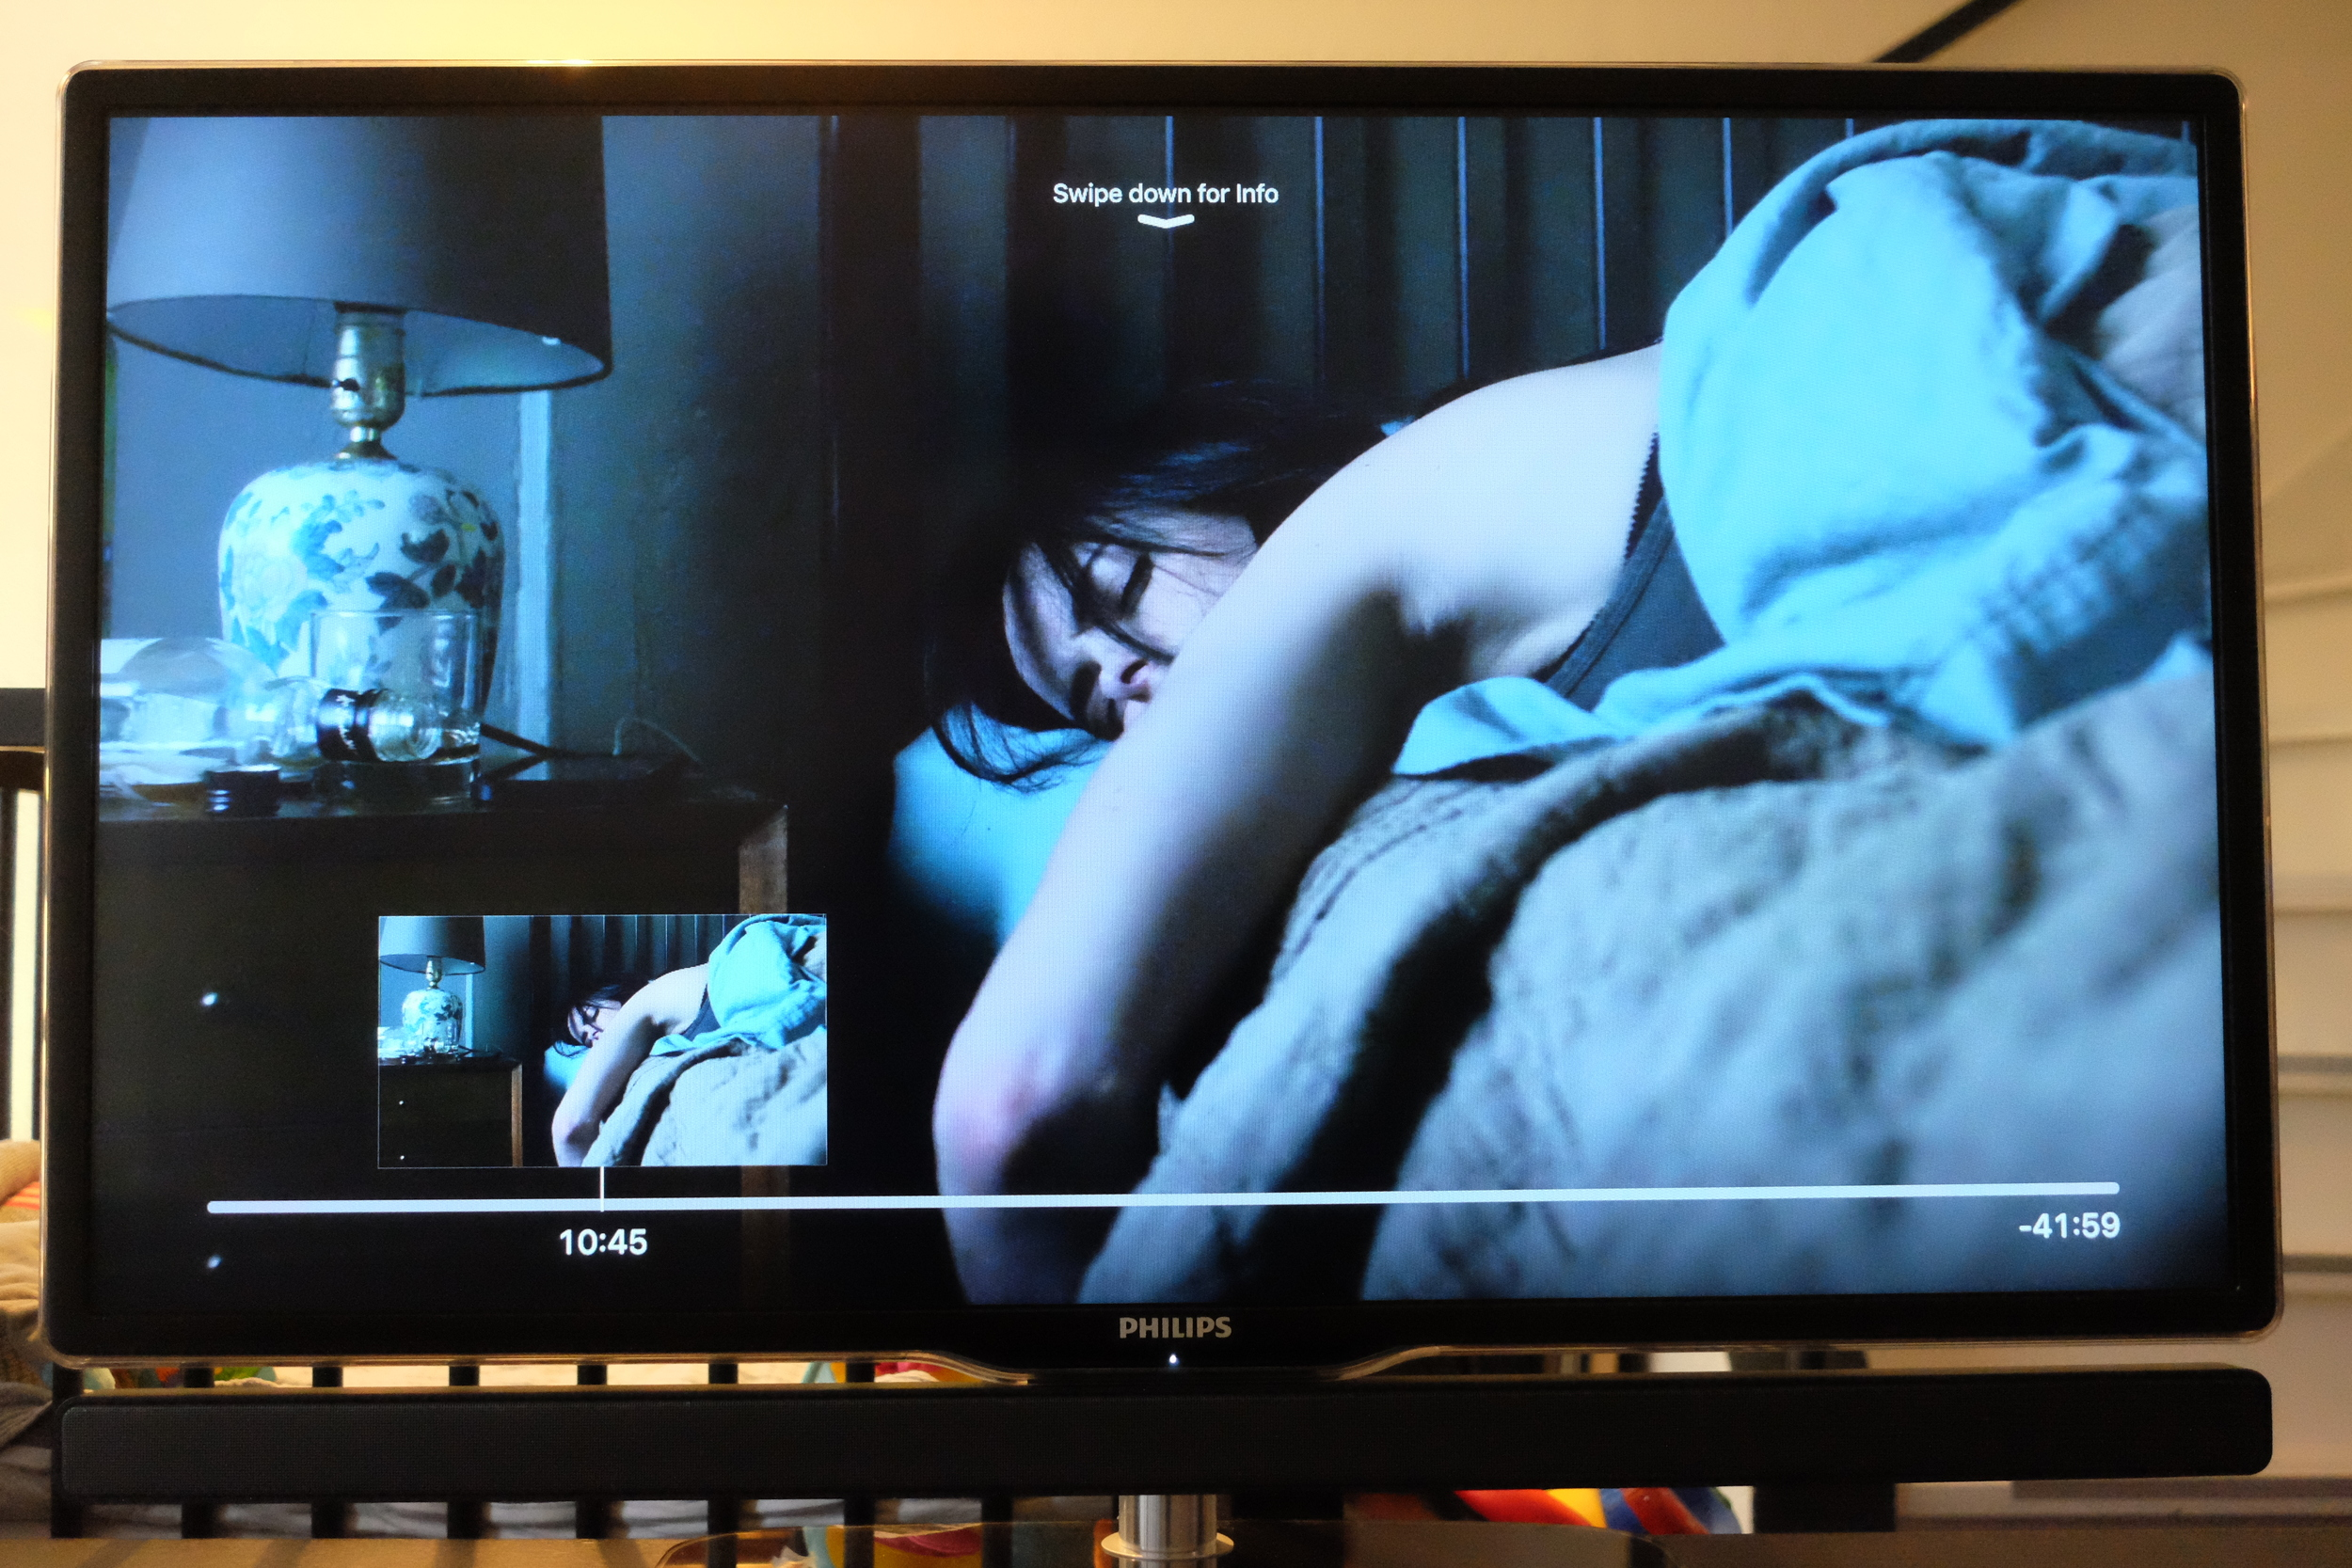 Experience Netflix on the Apple TV